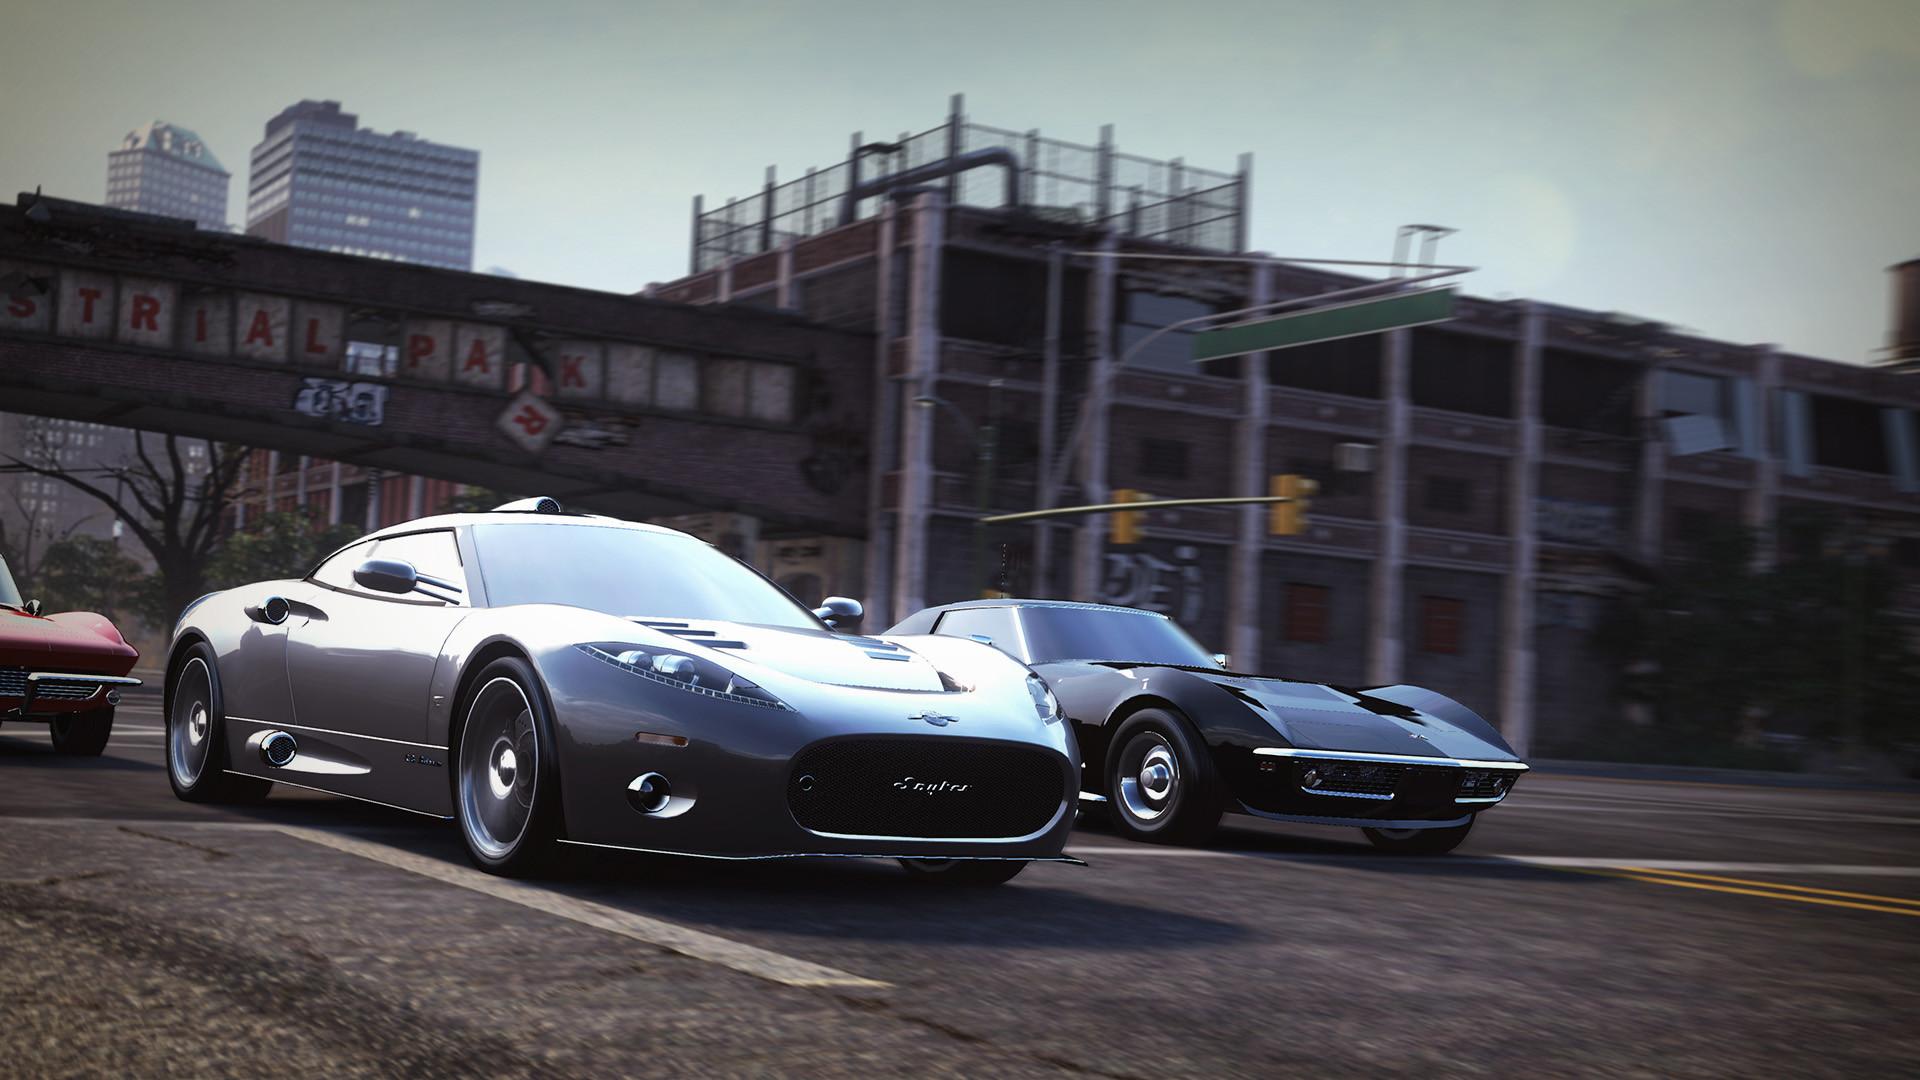 artstation - the crew - realistic car modelling, rabcat game art